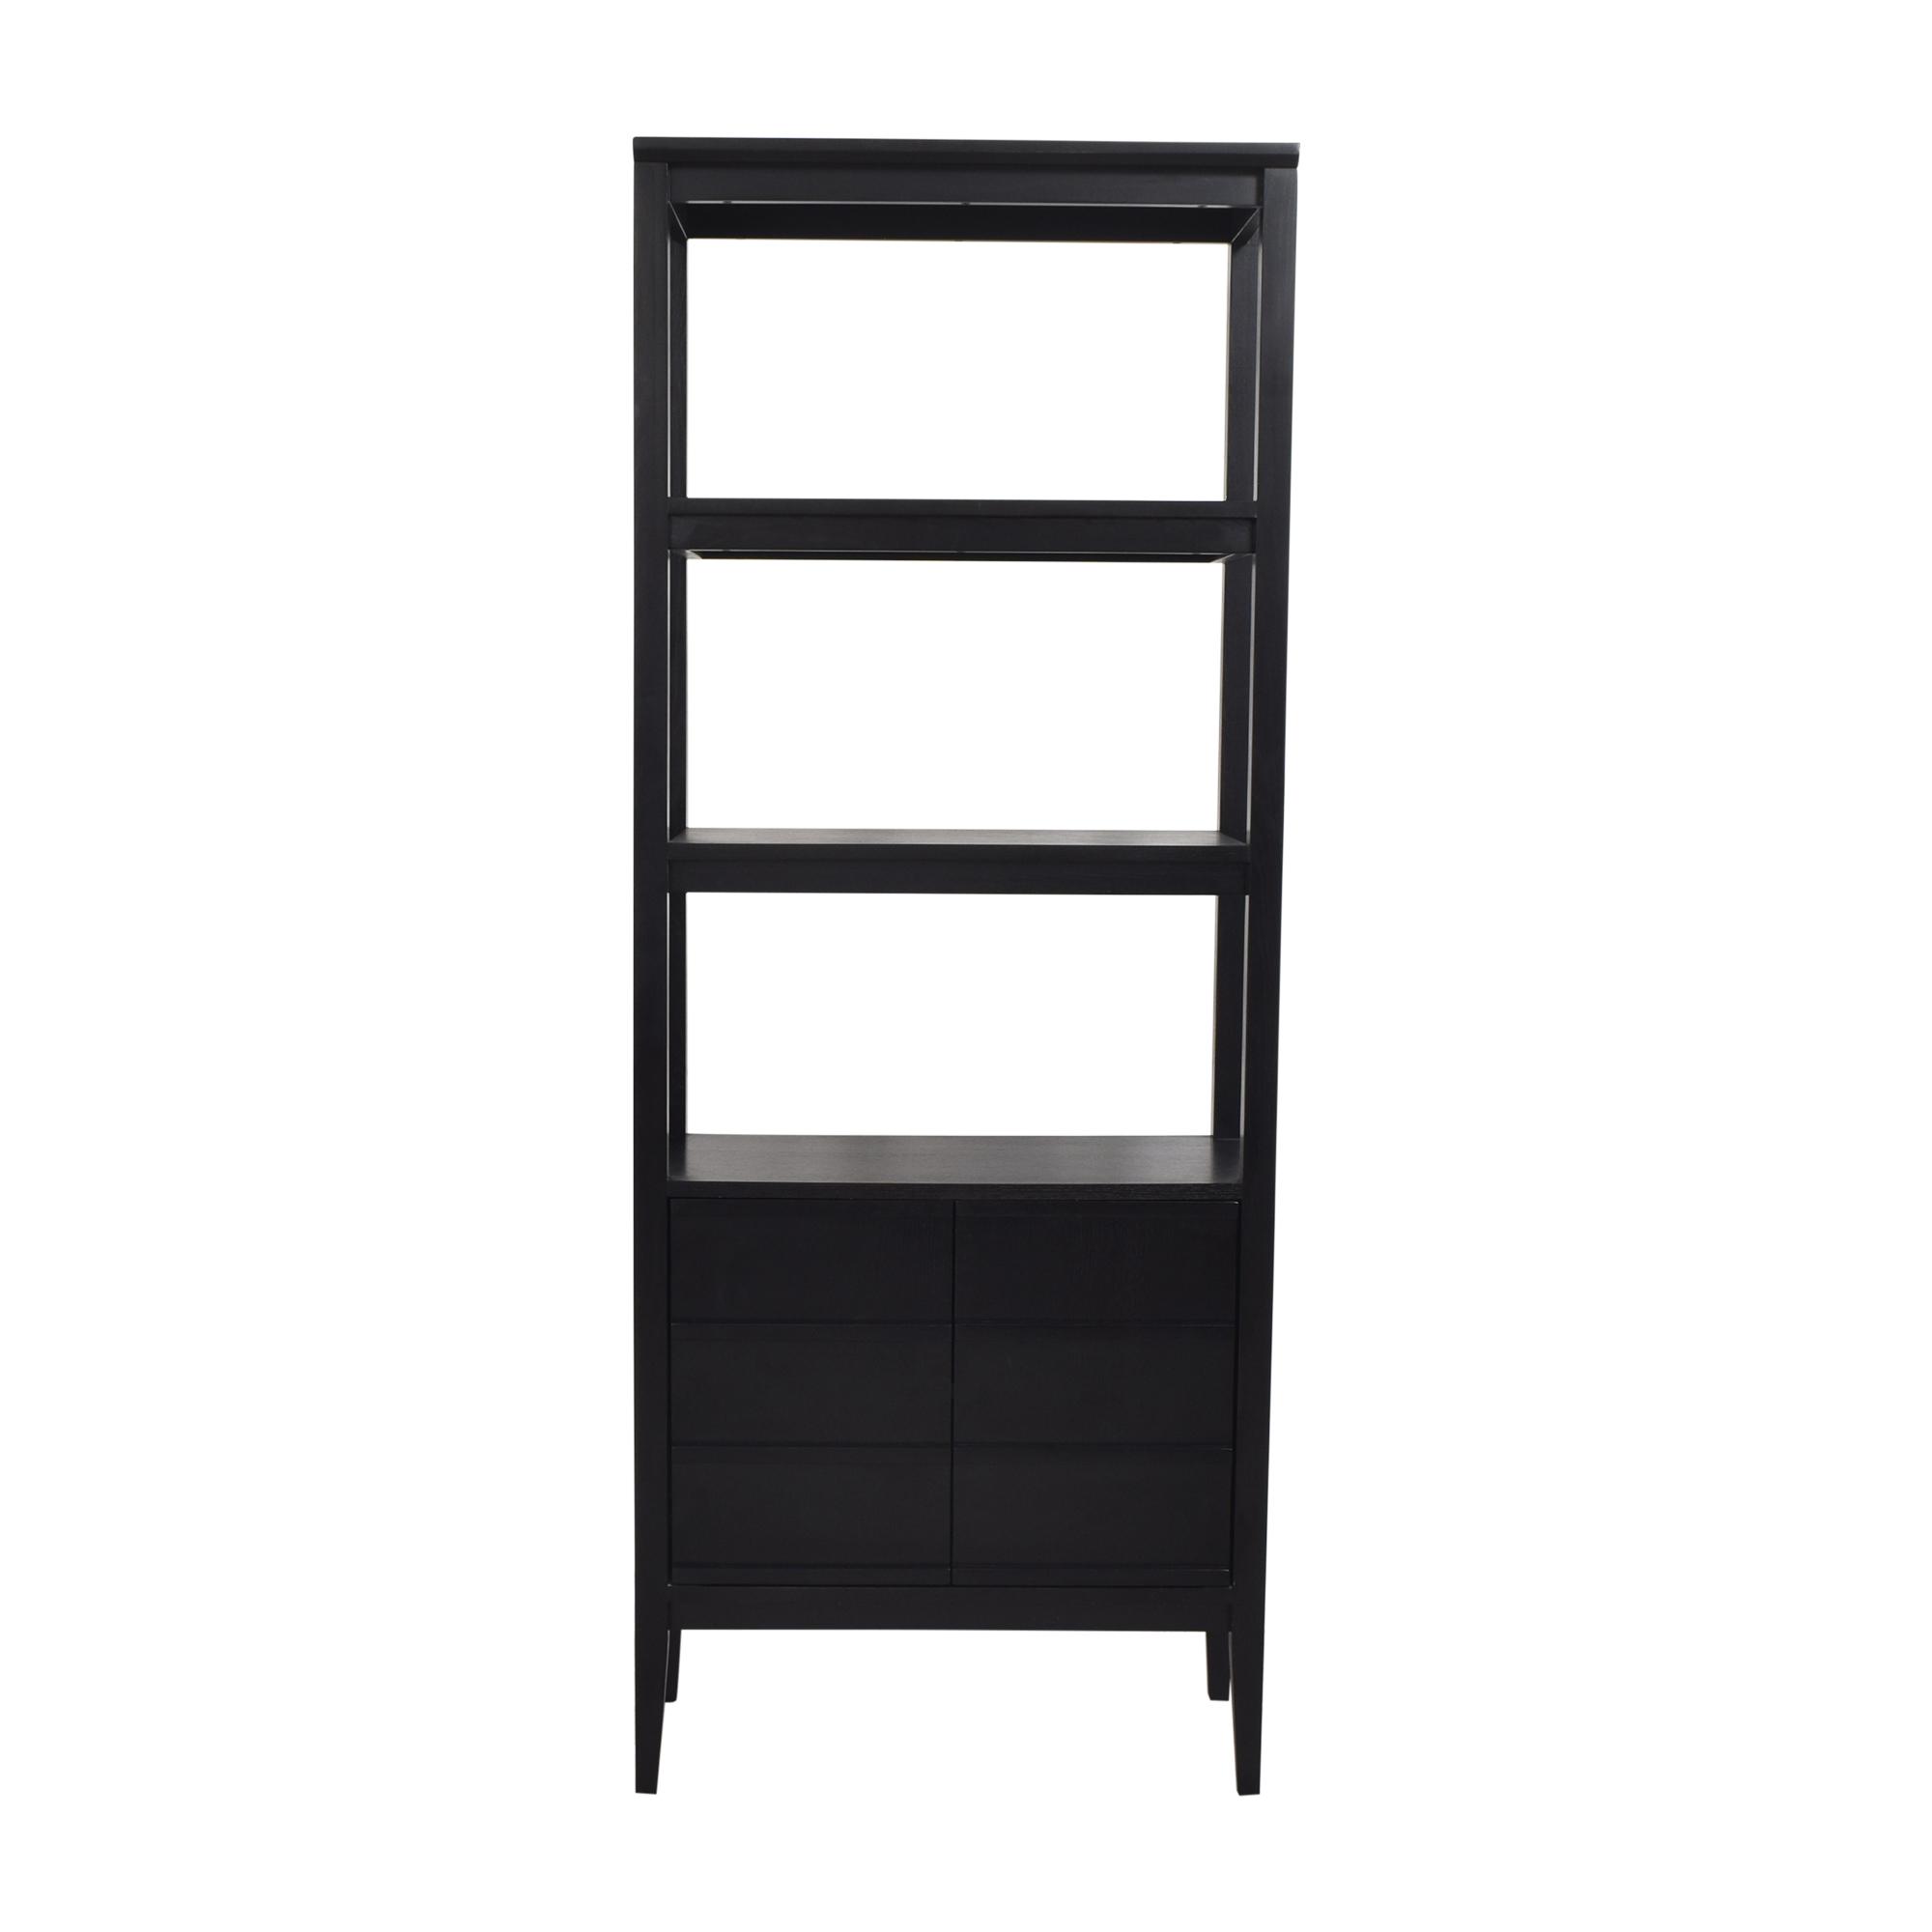 buy Crate & Barrel Crate & Barrel Spotlight Bookcase online